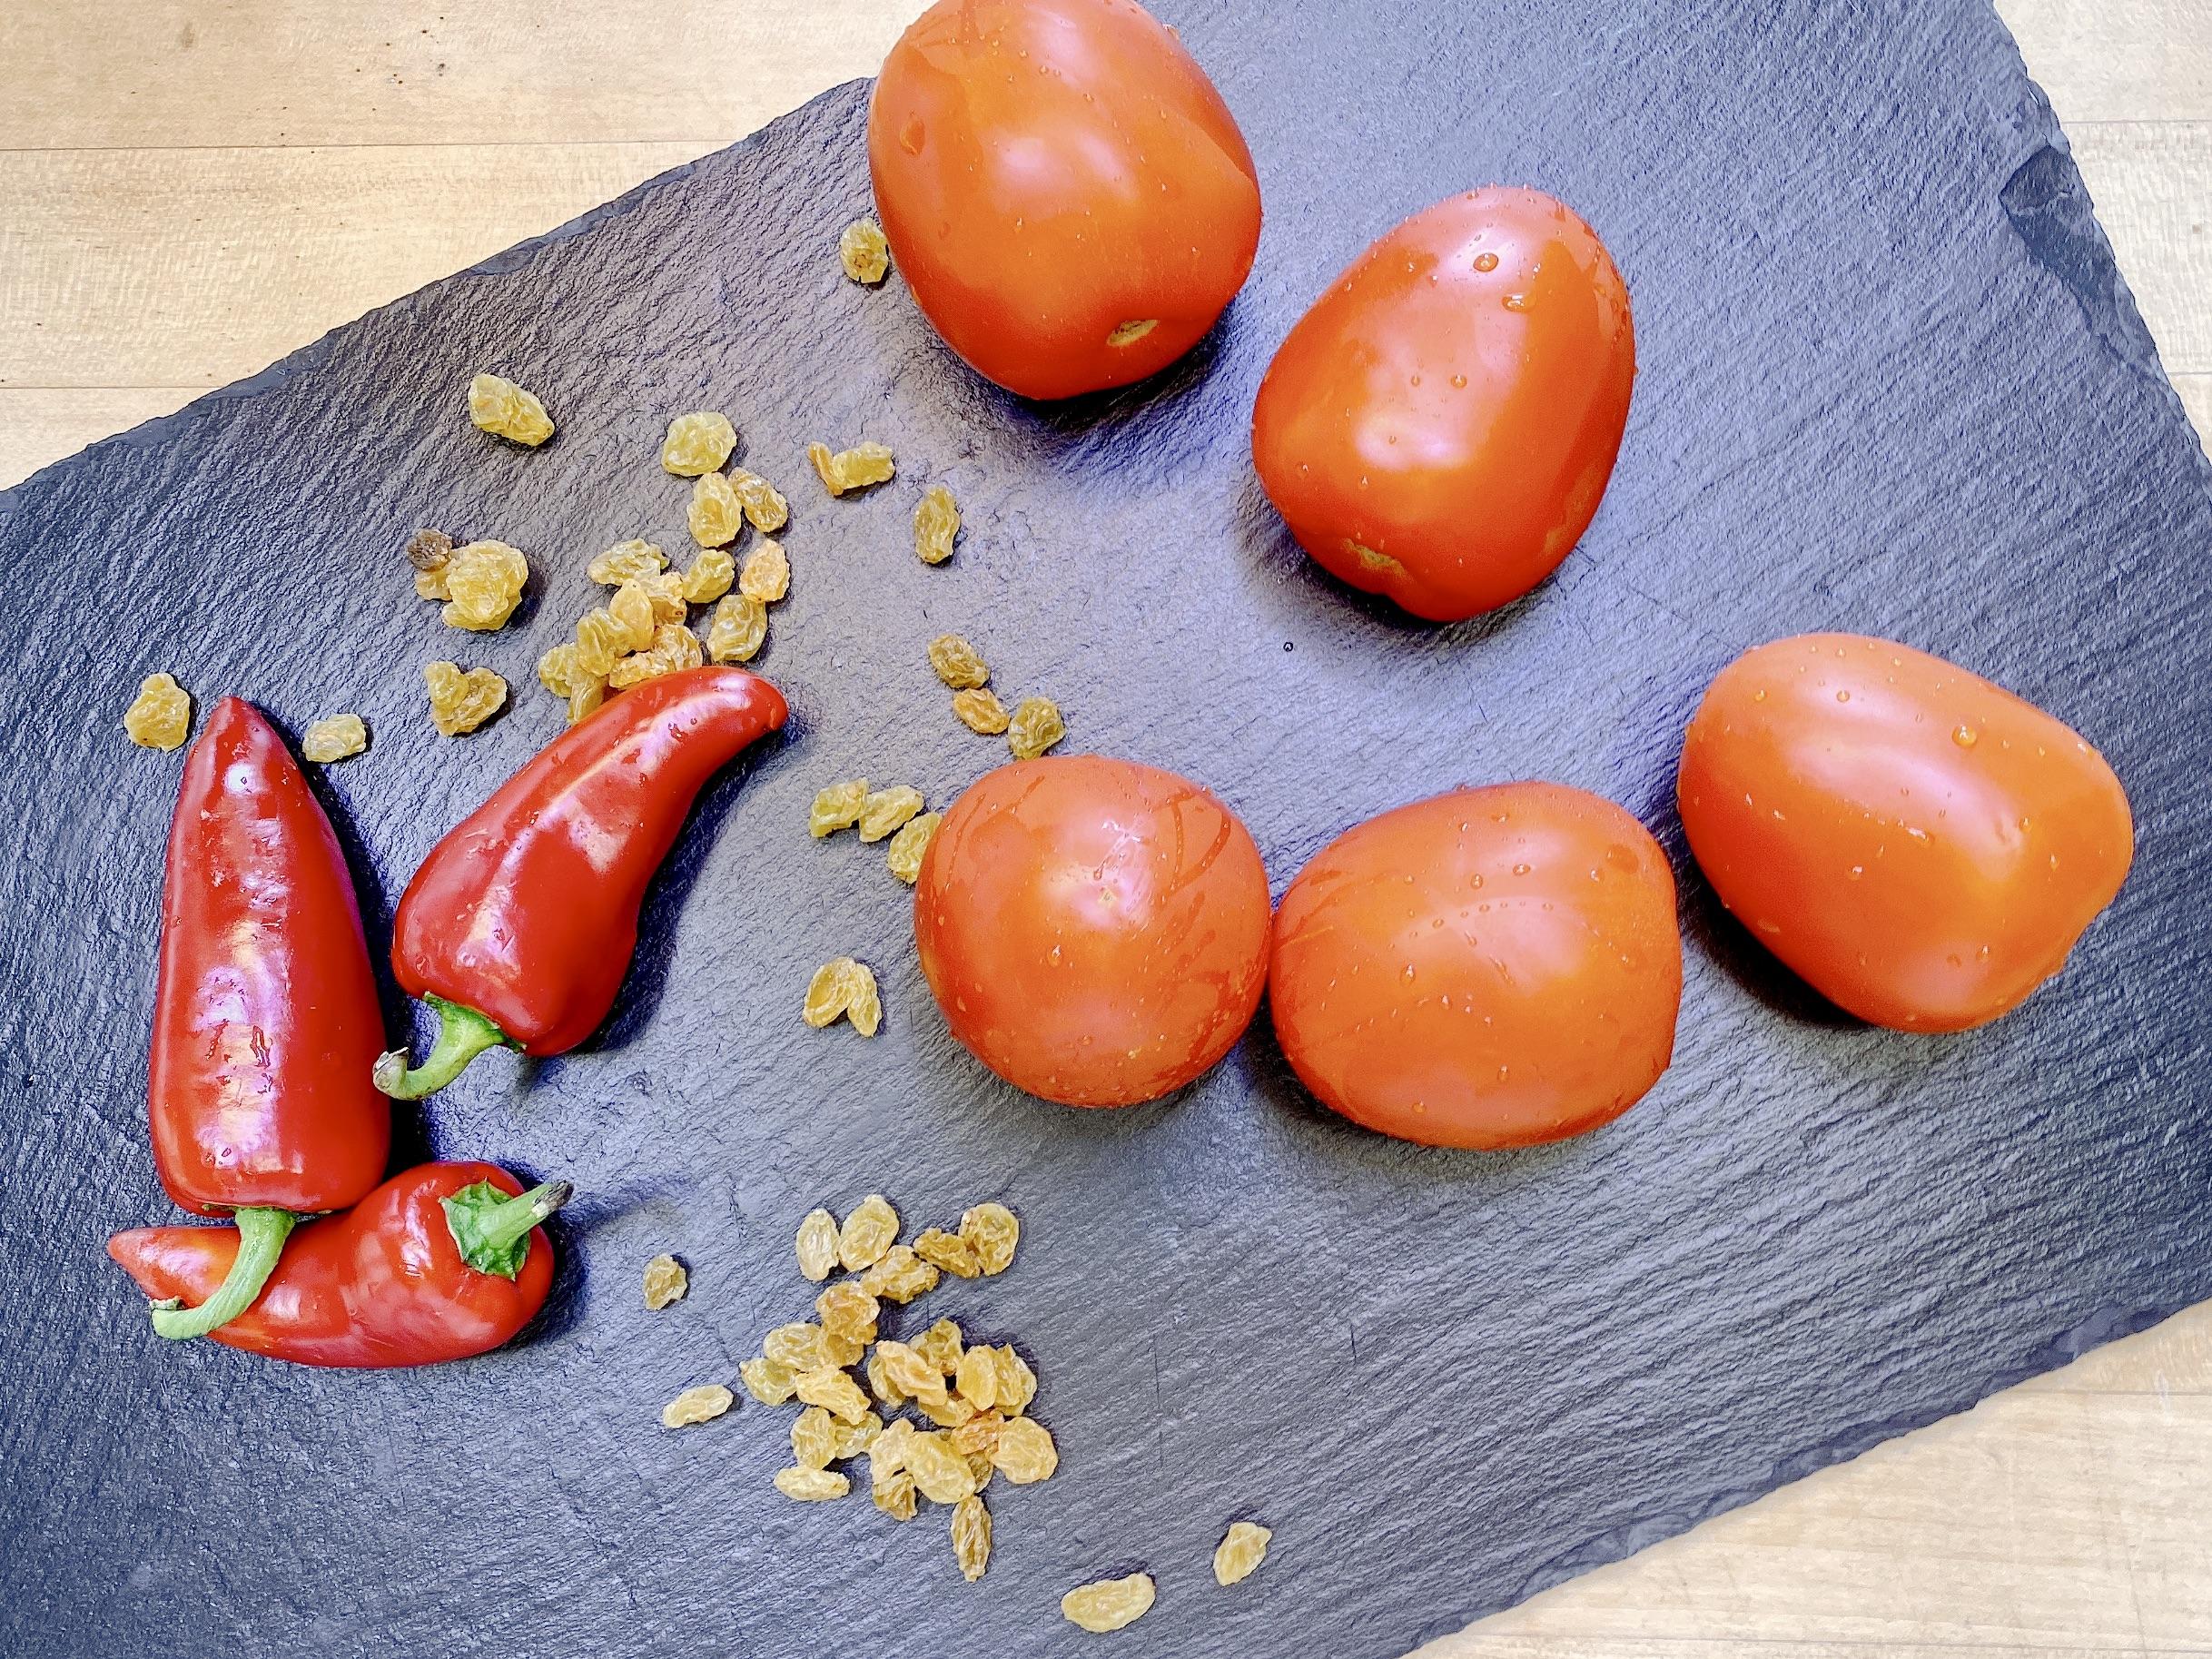 tomatoes, Fresno chiles and golden raisins